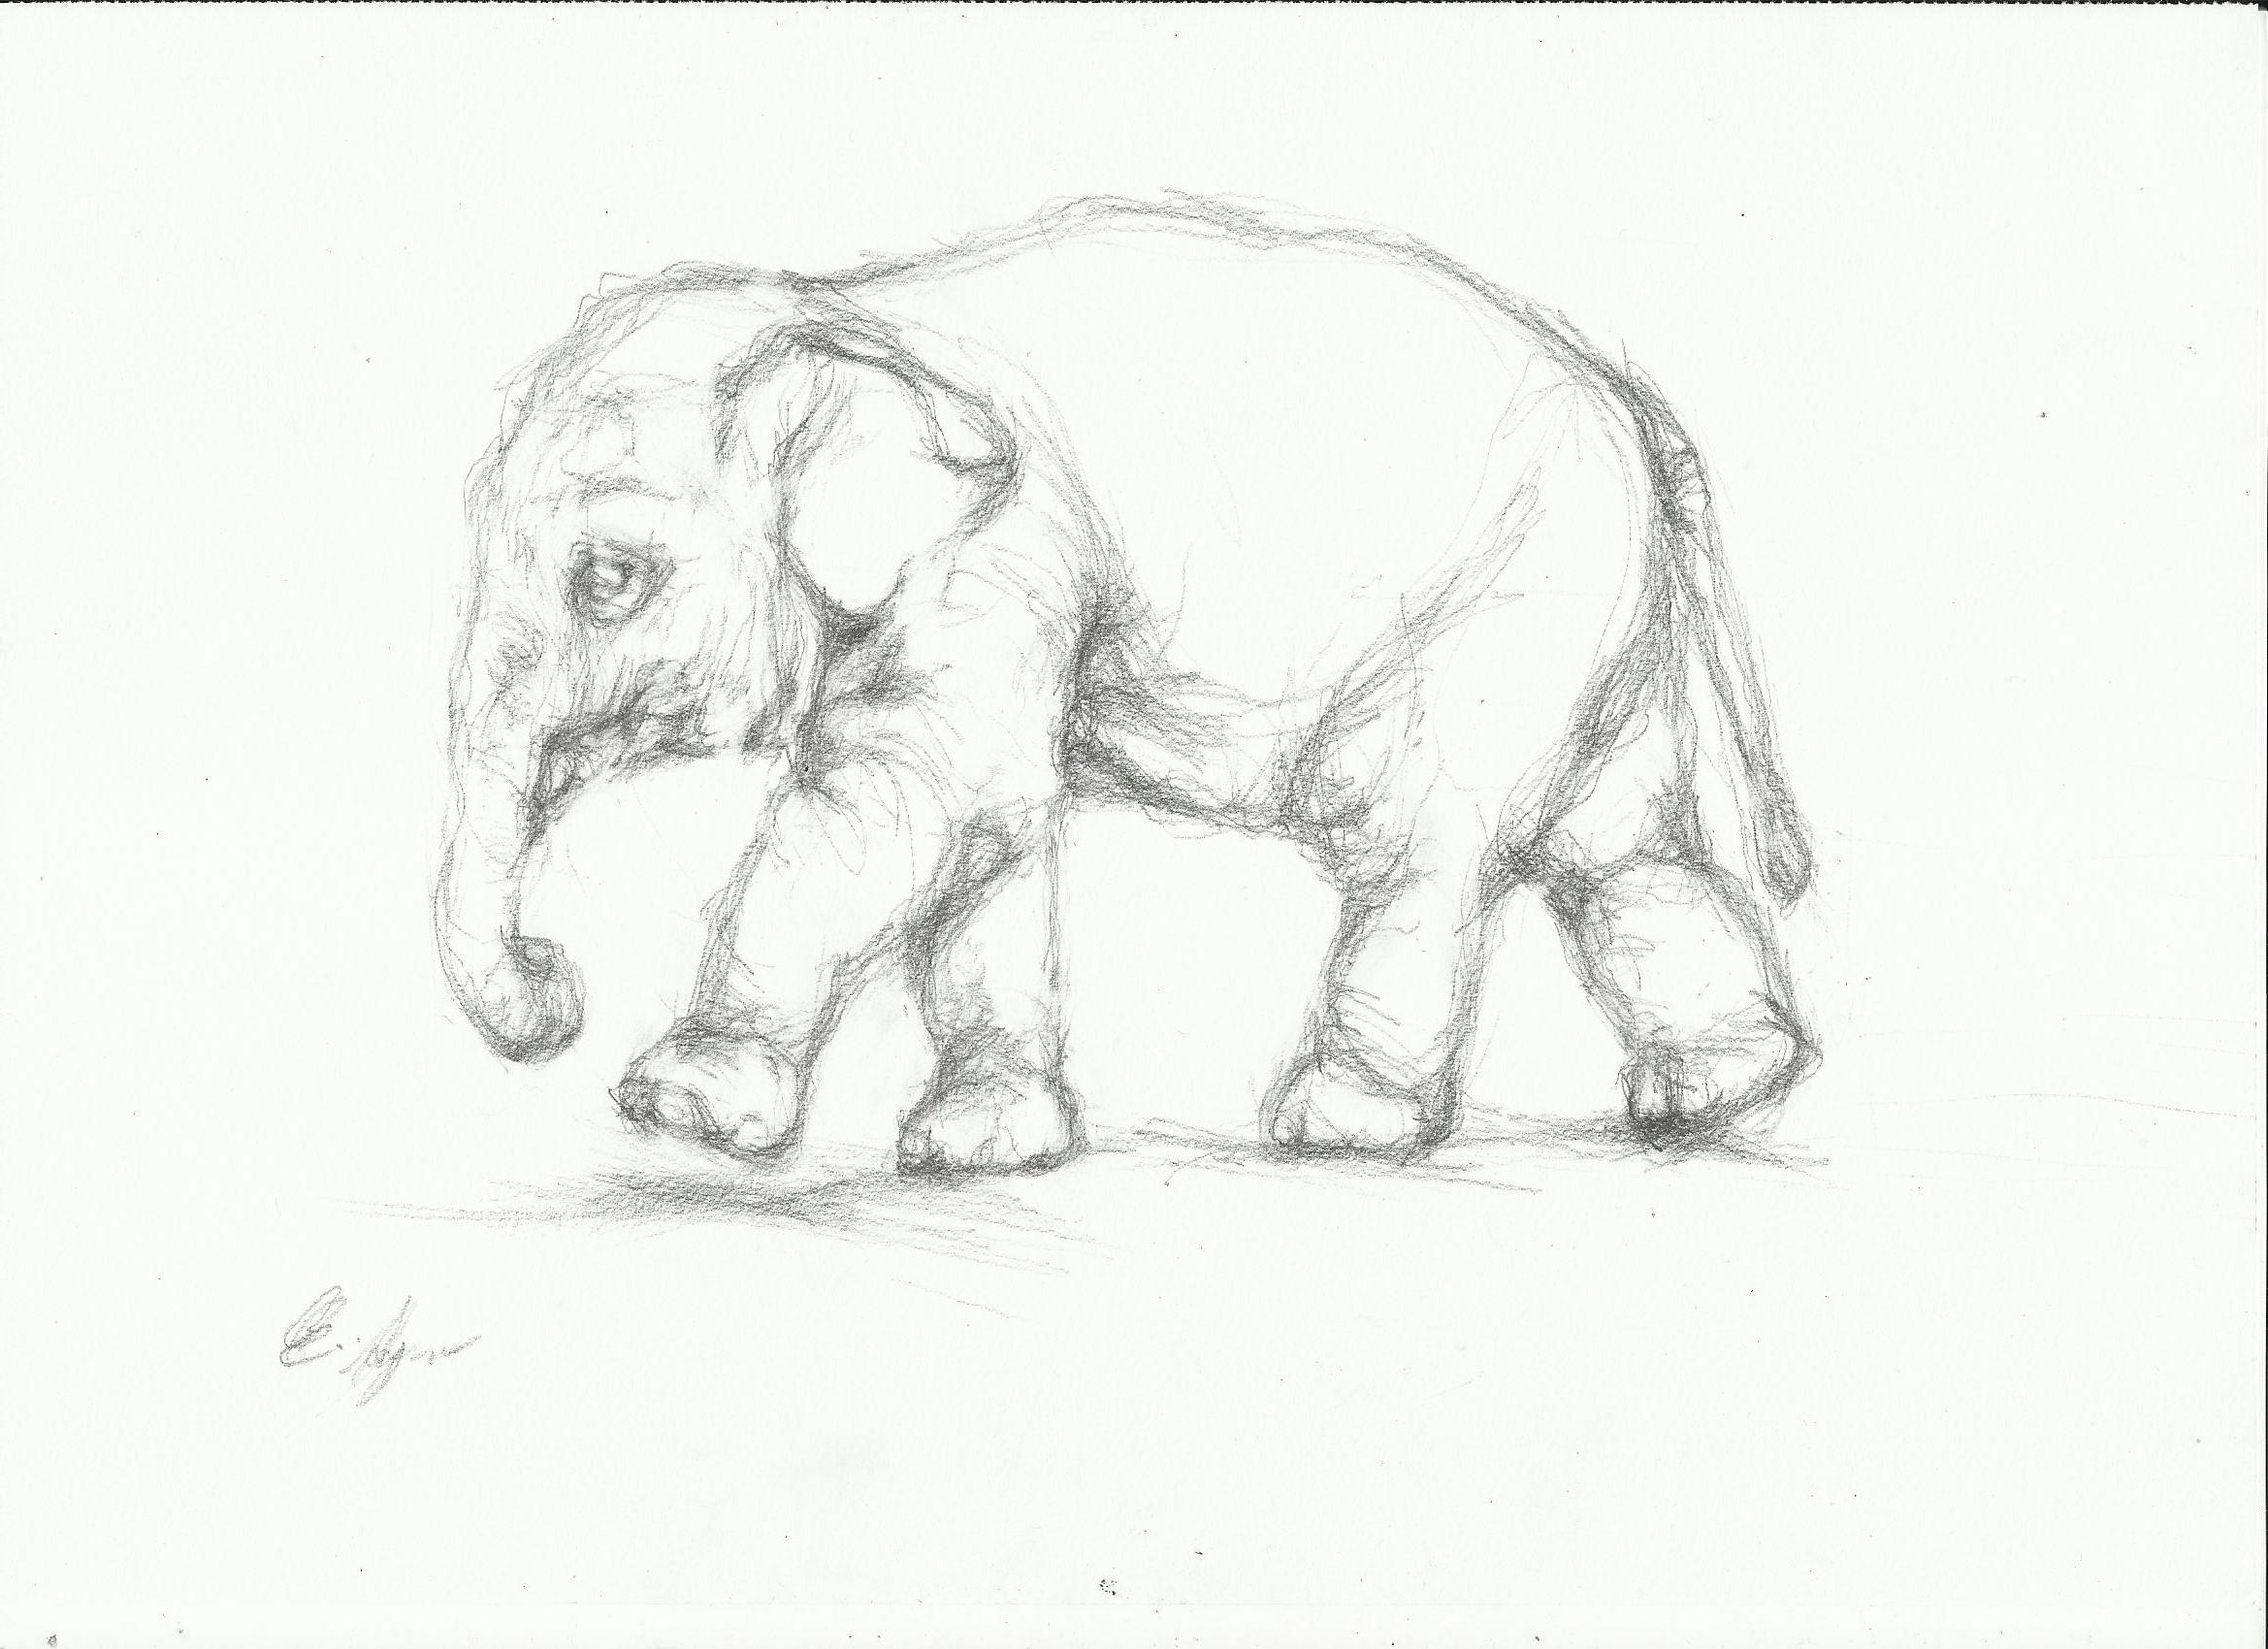 2338x1700 Elephant Pencil Drawing Drawn Elephant Baby Elephant